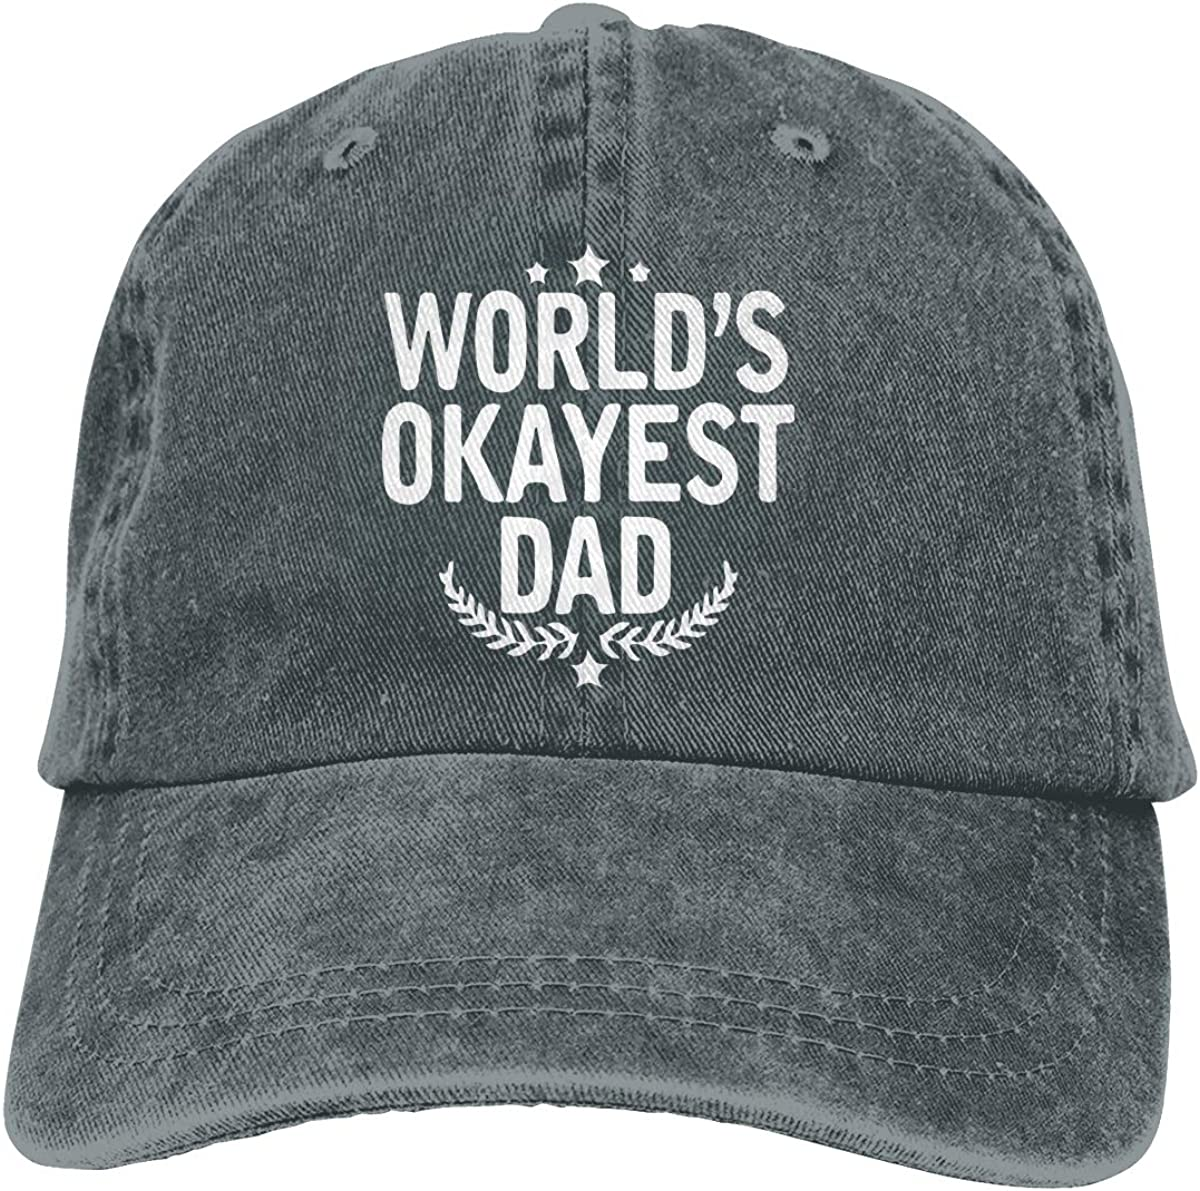 YISHOW Worlds Okayest Dad Unisex Adjustable Baseball Caps Denim Hats Cowboy Sport Outdoor